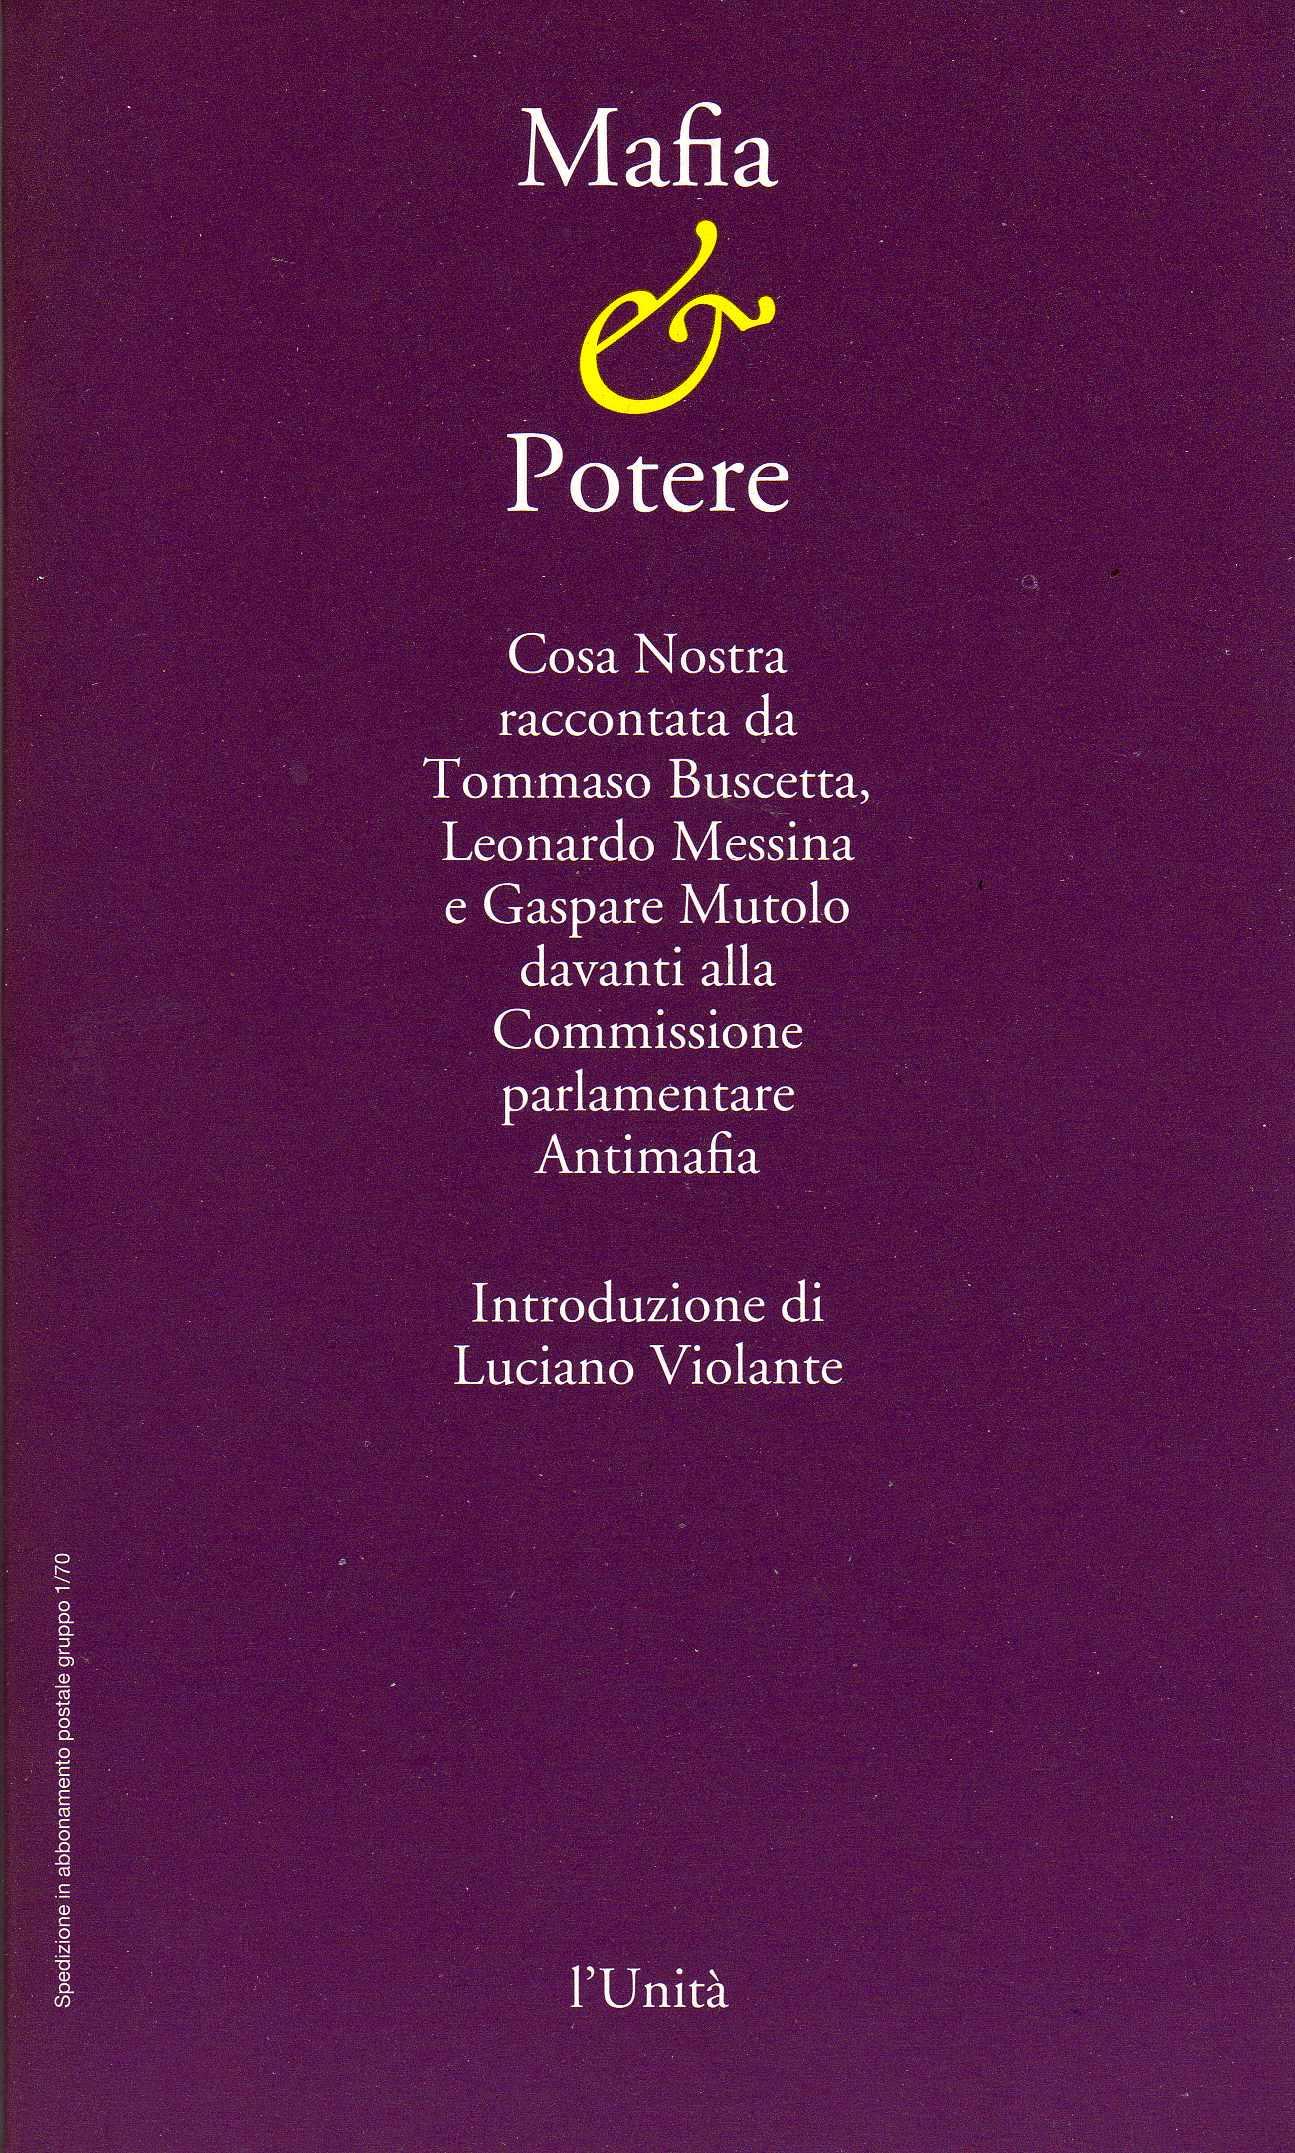 Mafia & Potere